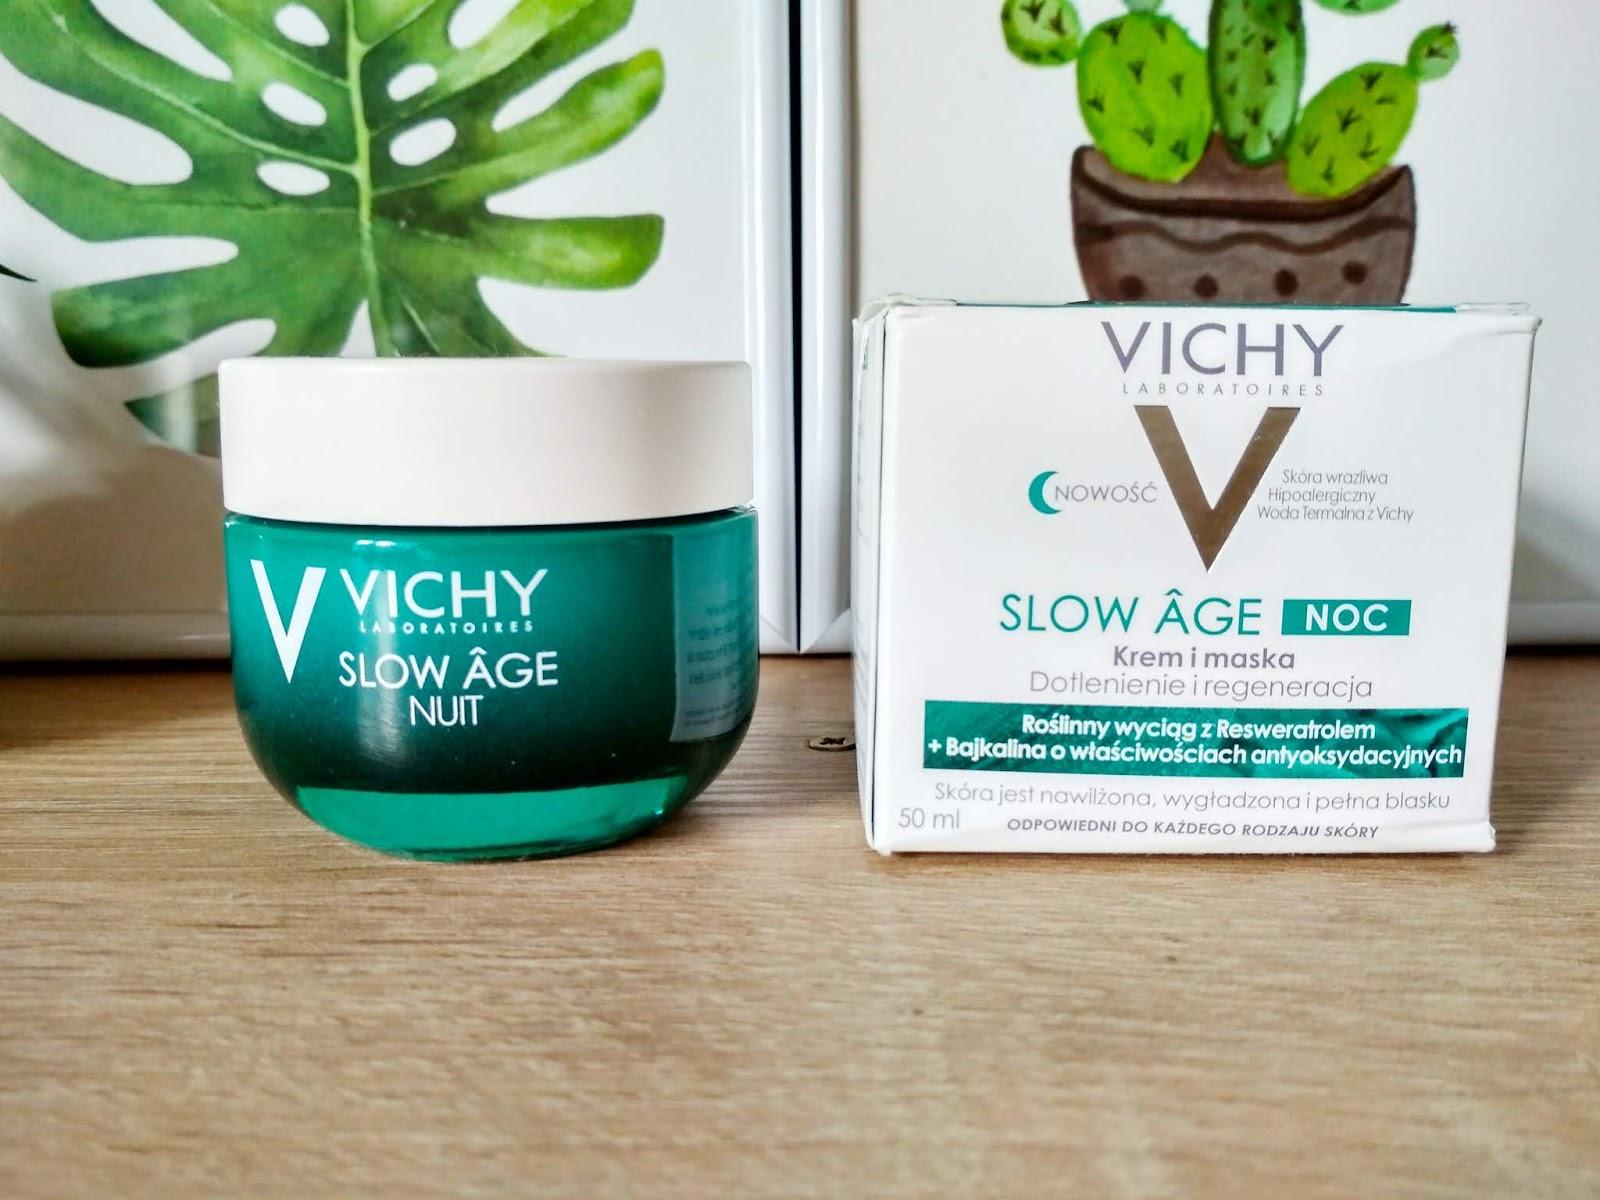 Recenzja - Vichy  Slow Age krem i maska dotlenienie i regeneracja